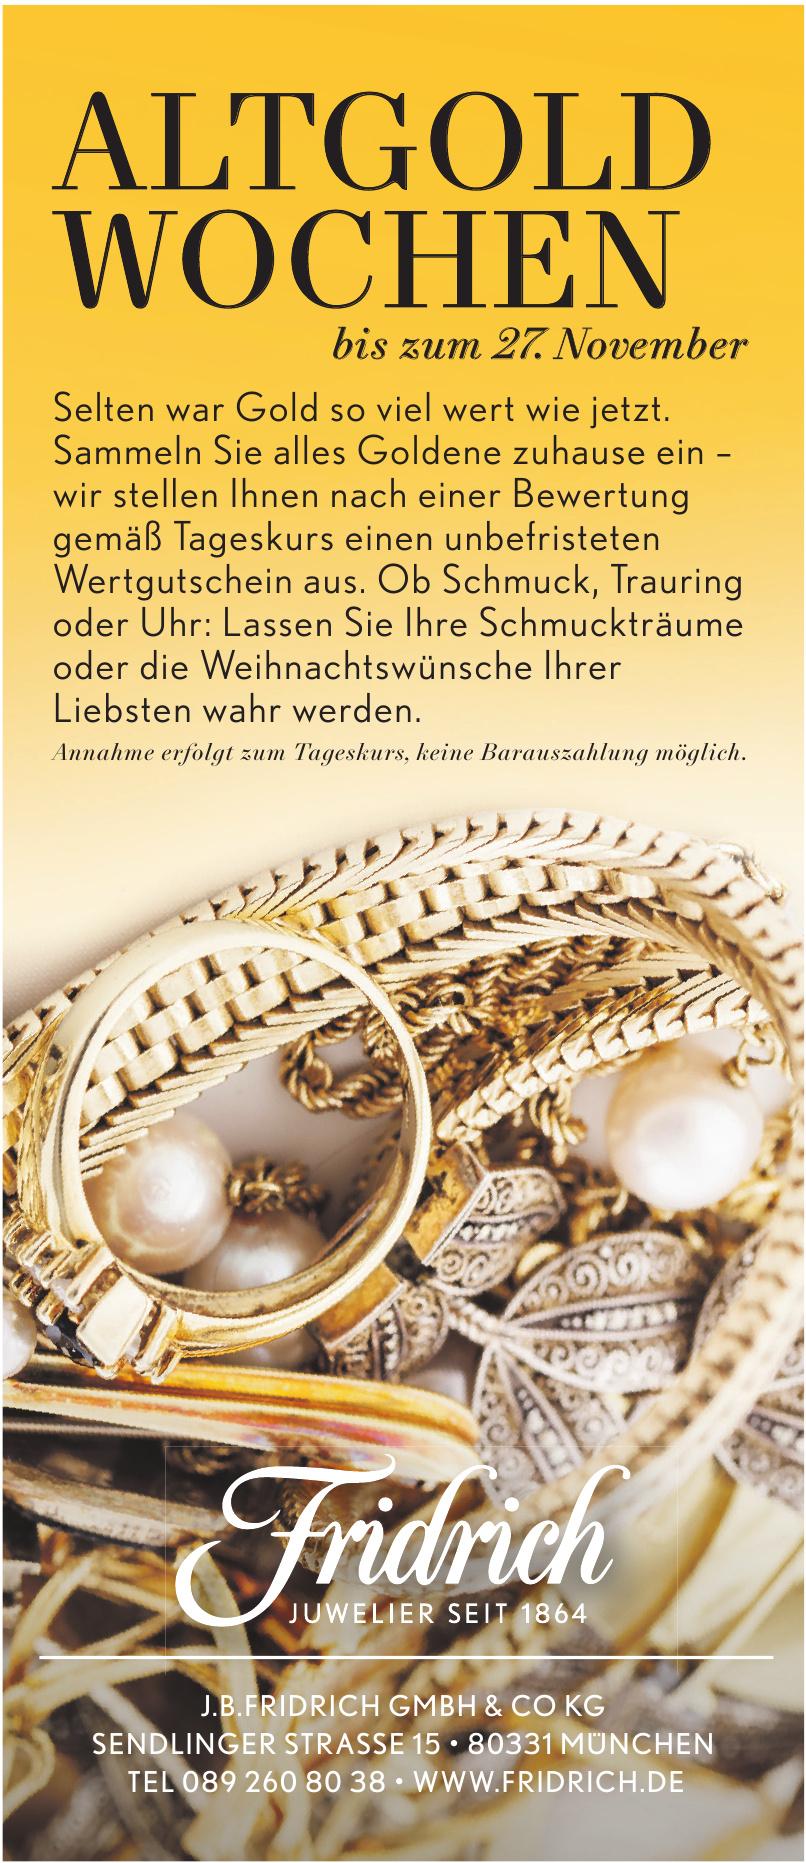 J.B. Fridrich GmbH & Co KG